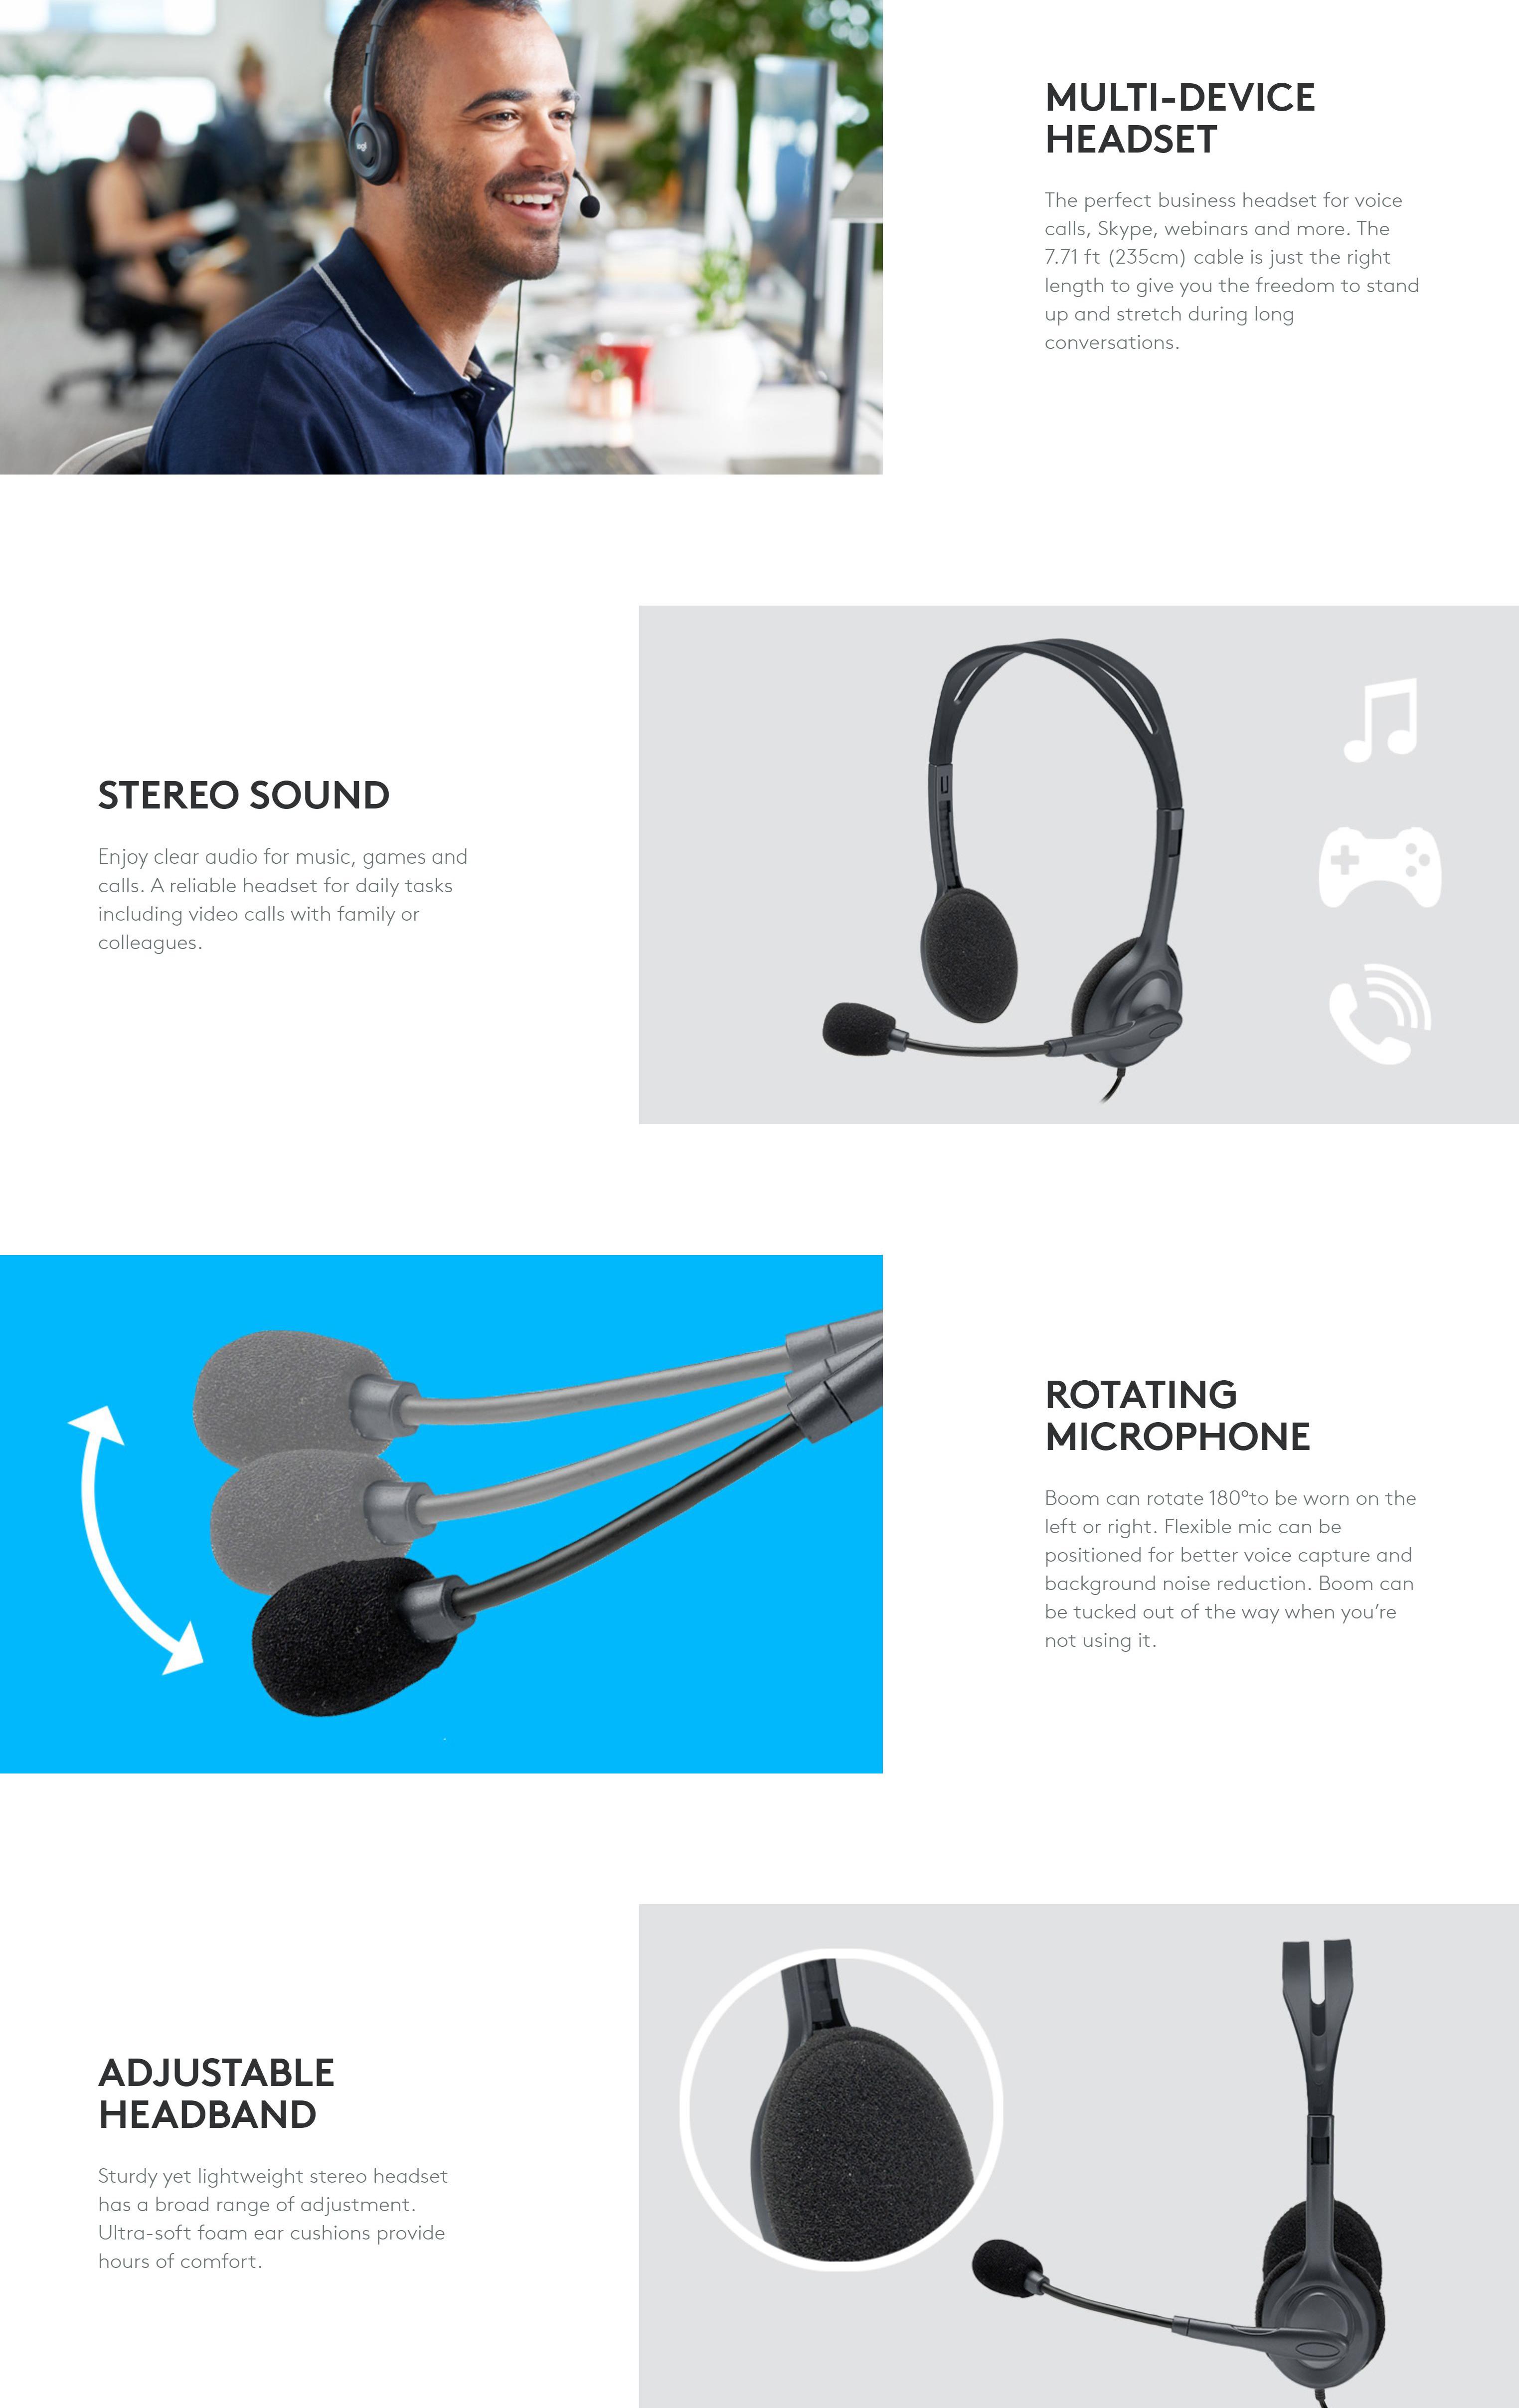 #1845---'Logitech-H111-Stereo-Headset-with-Adjustable-Headband-and-Boom-Mic'---www_logitech_com.jpg